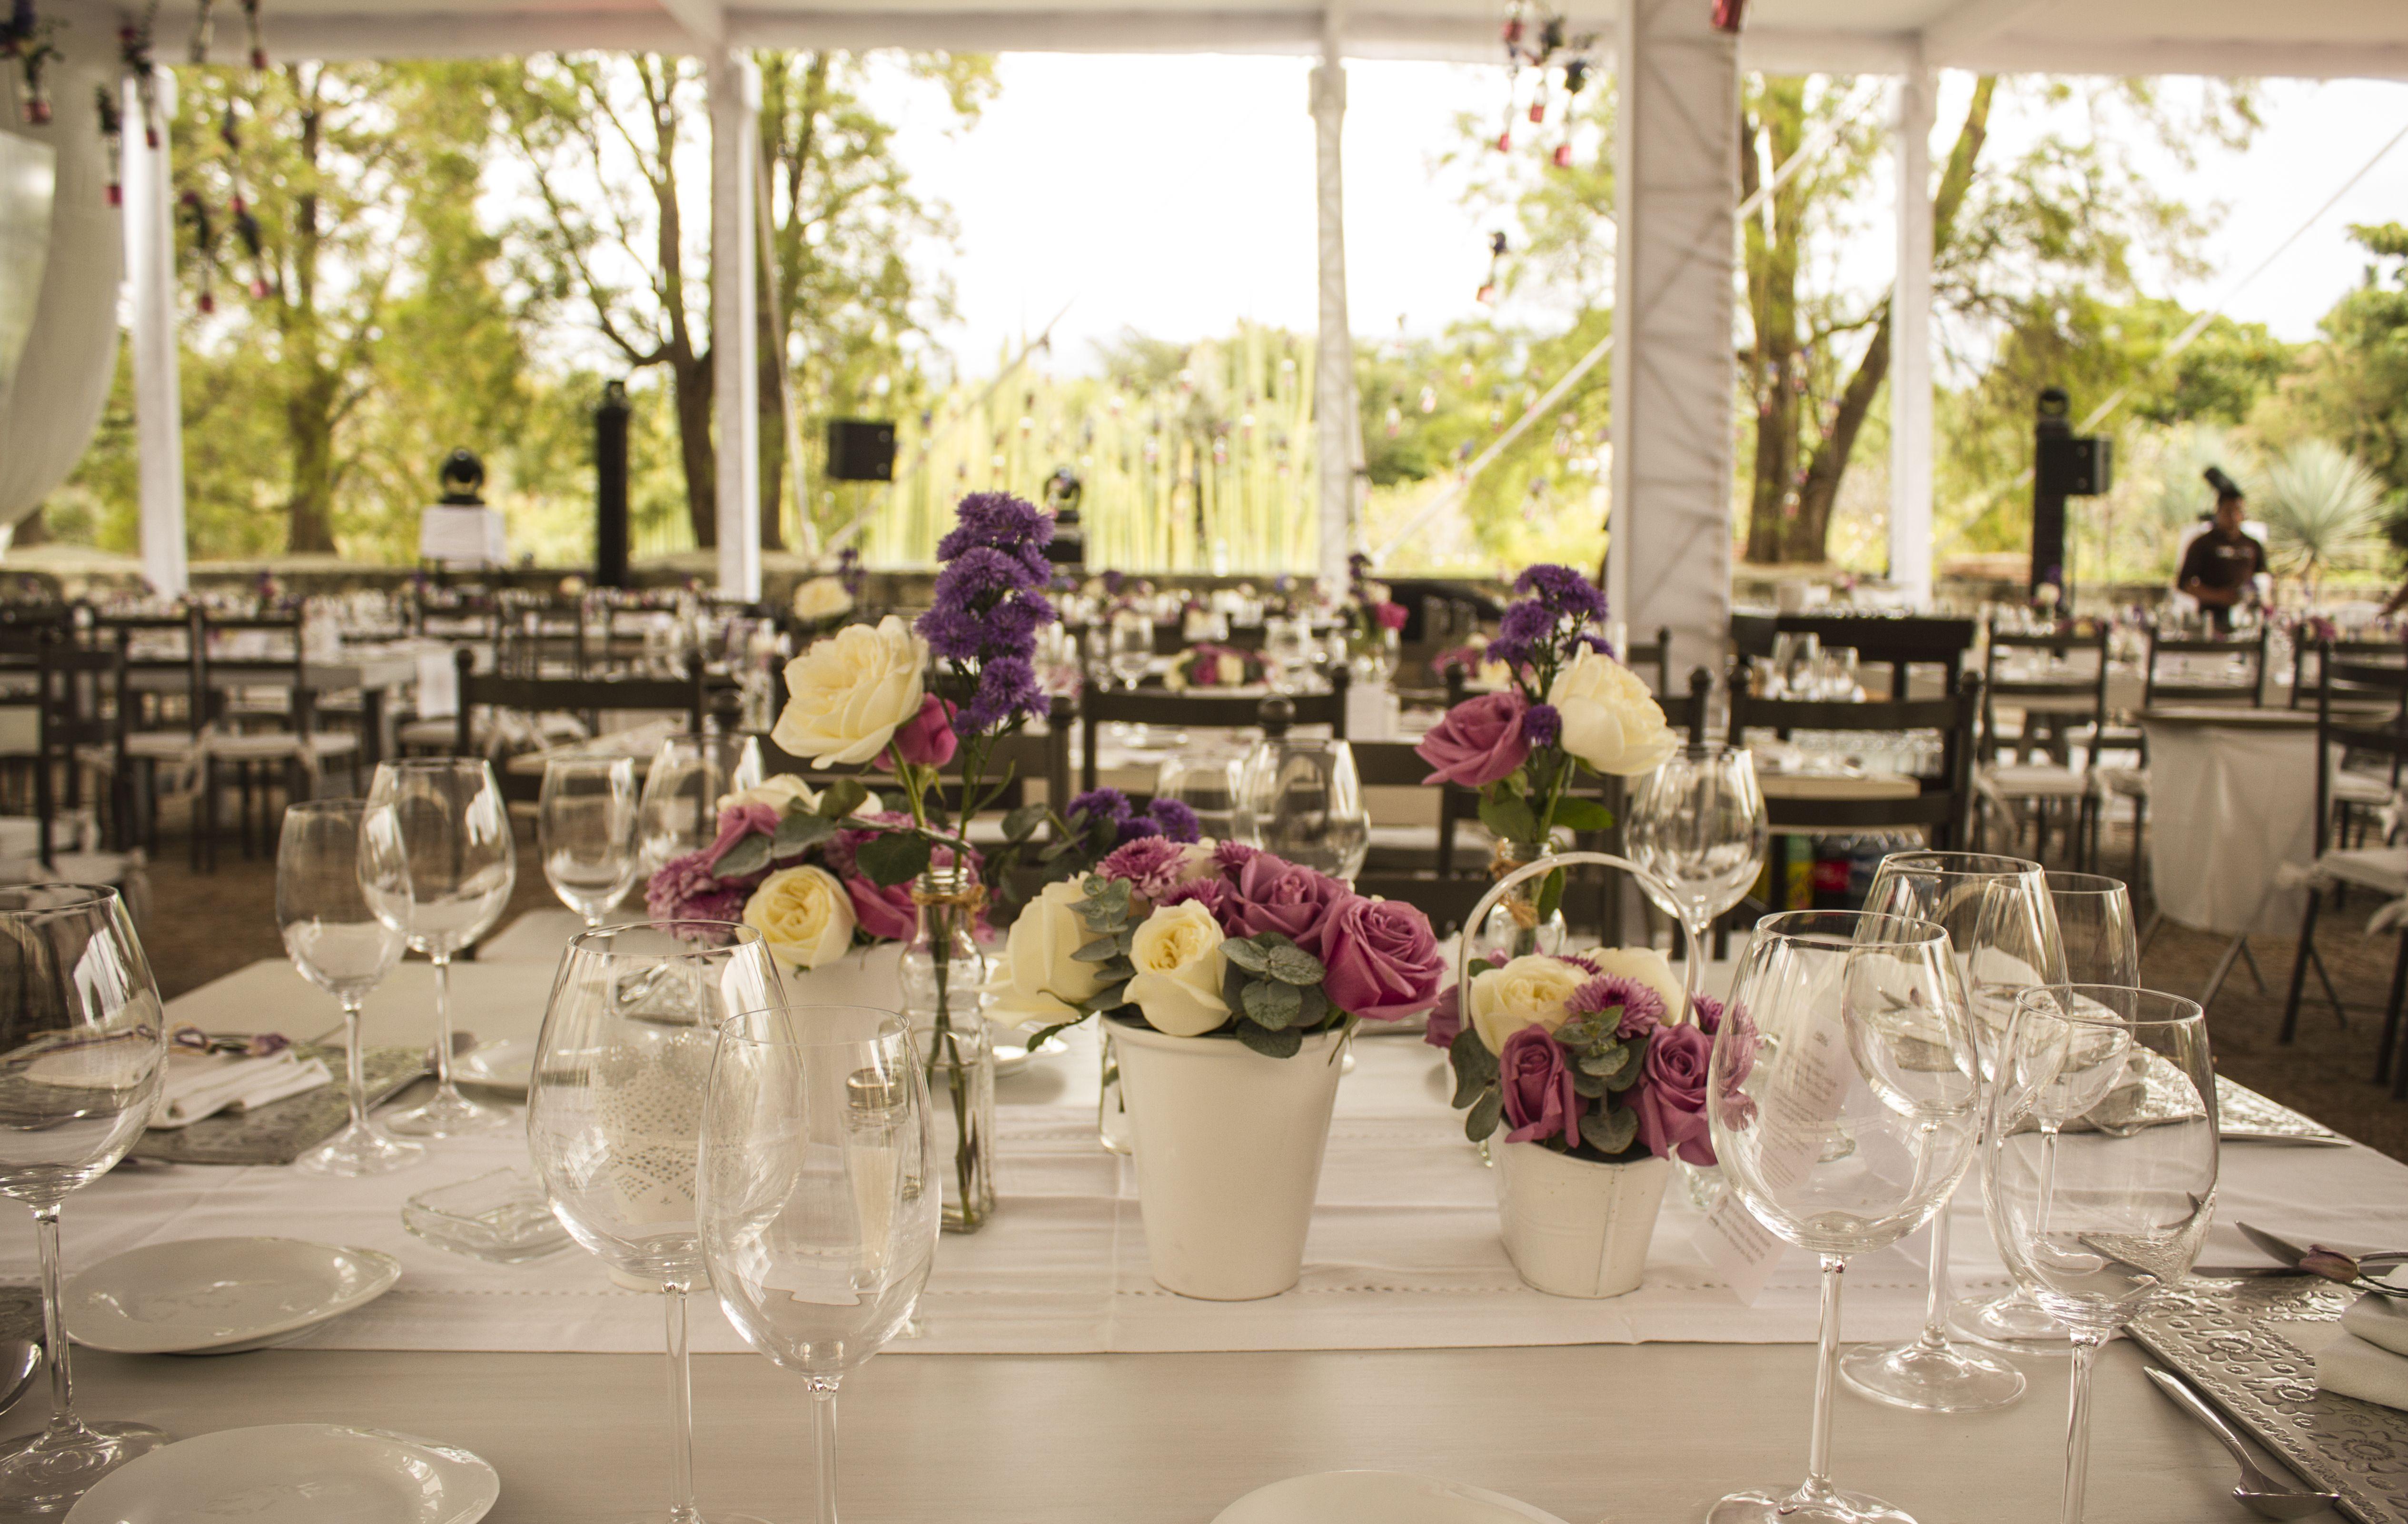 Jardin etnobotanico oaxaca boda de dia con elementos y for Bodas jardin botanico malaga